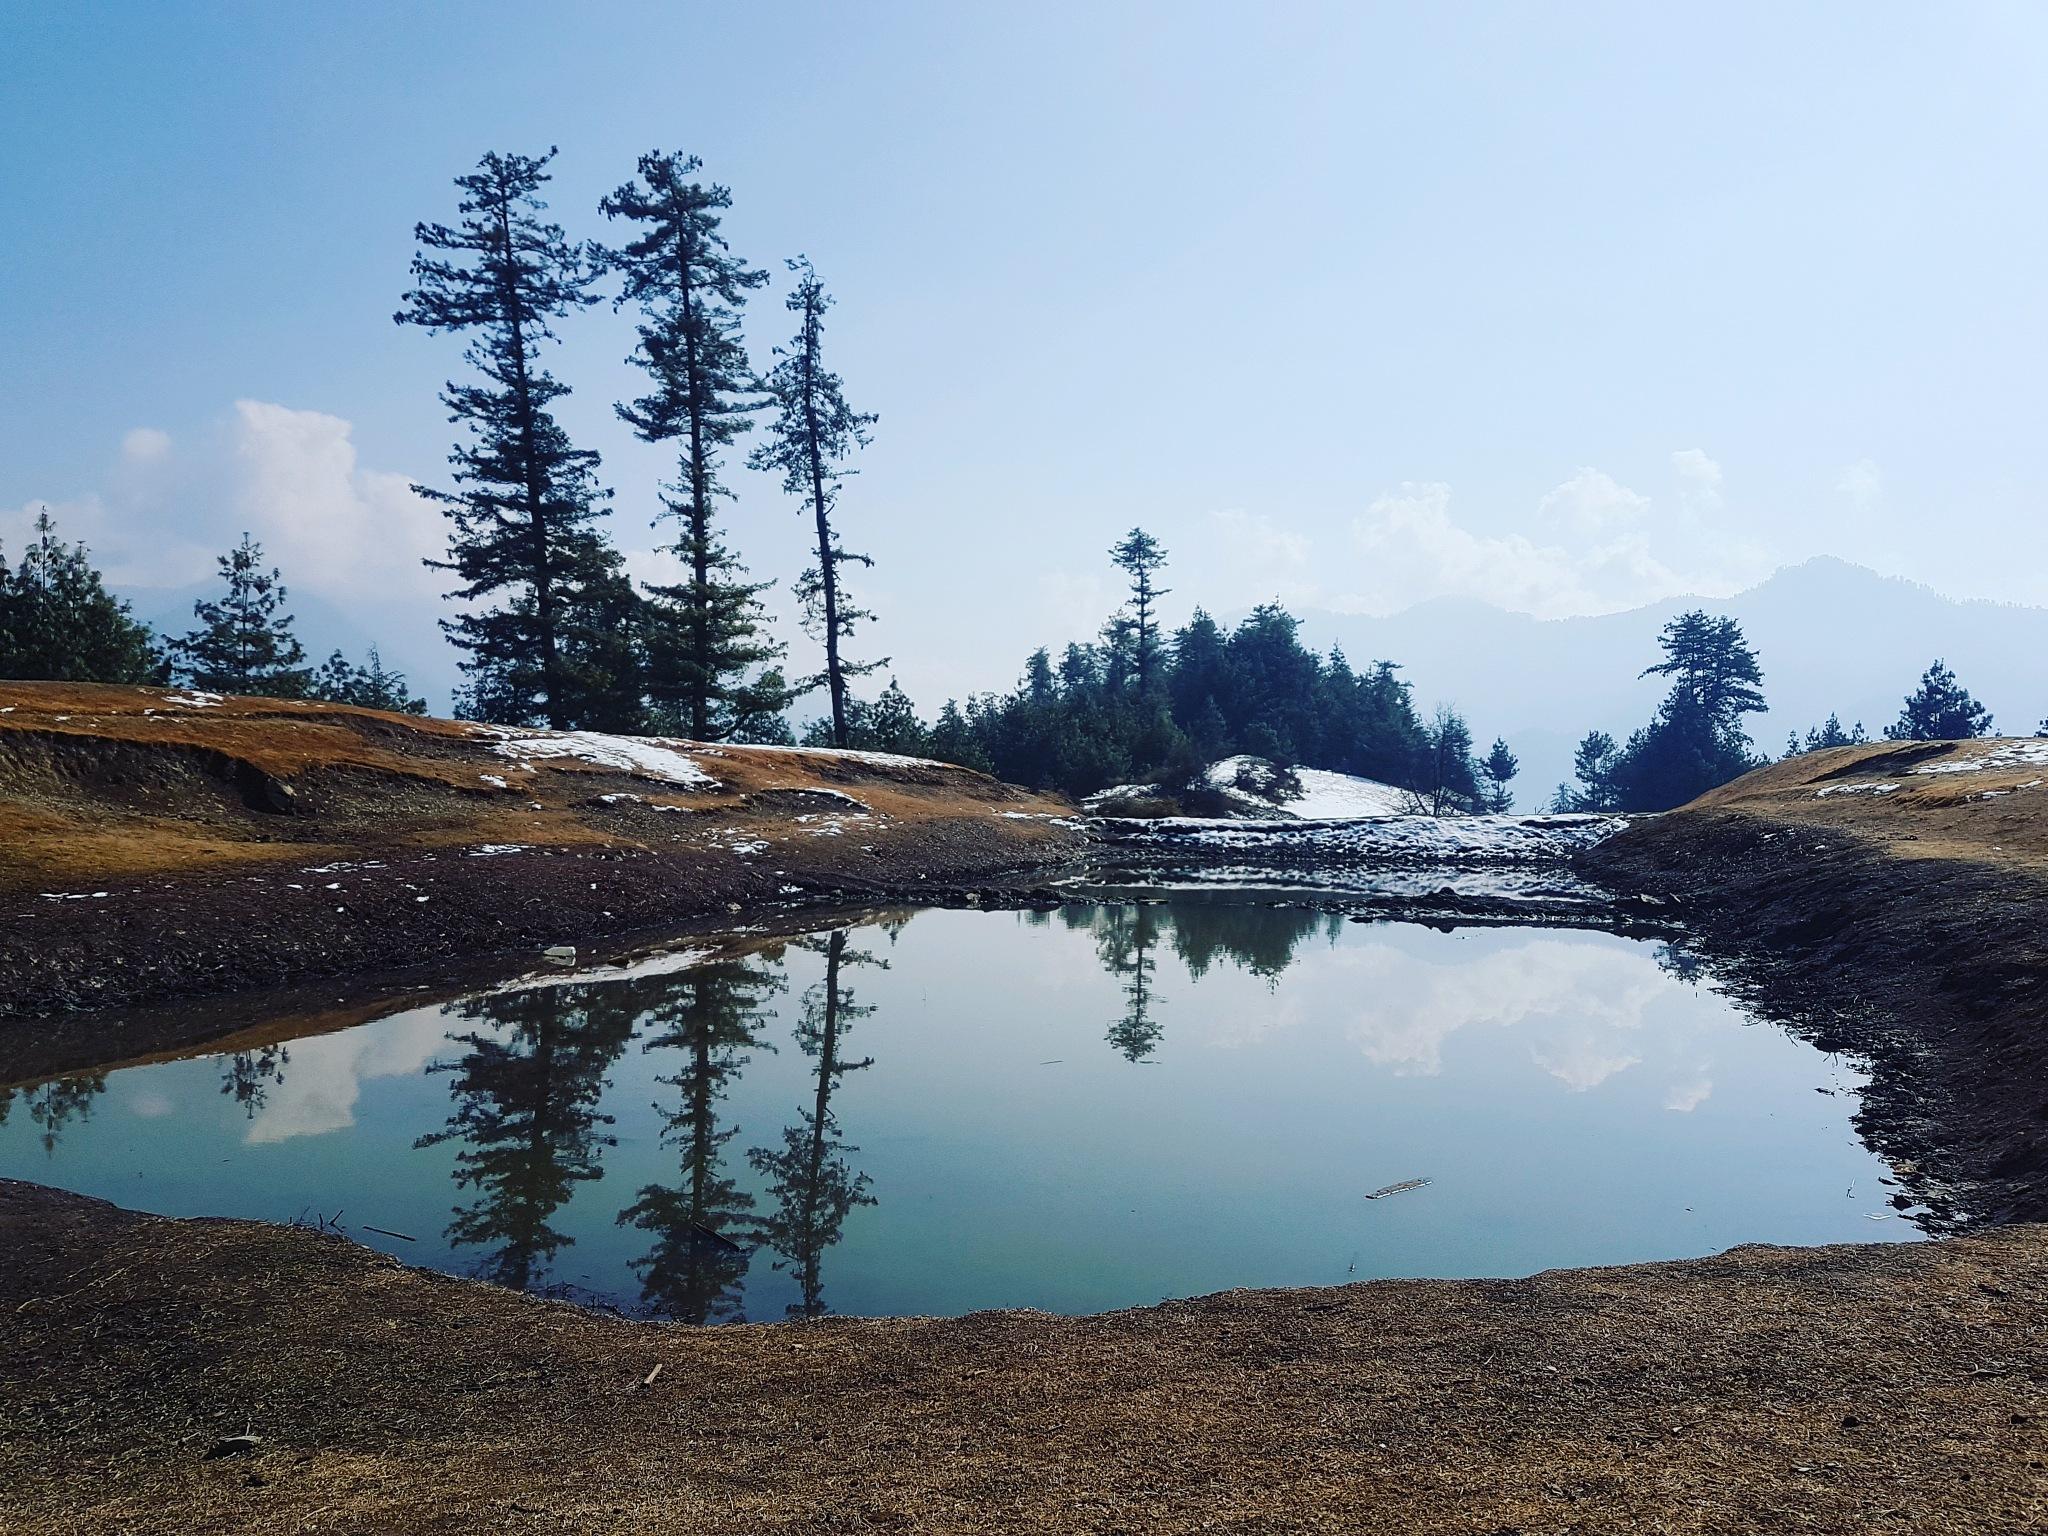 HillTop Lake by Sheetal Kumar Kaundal